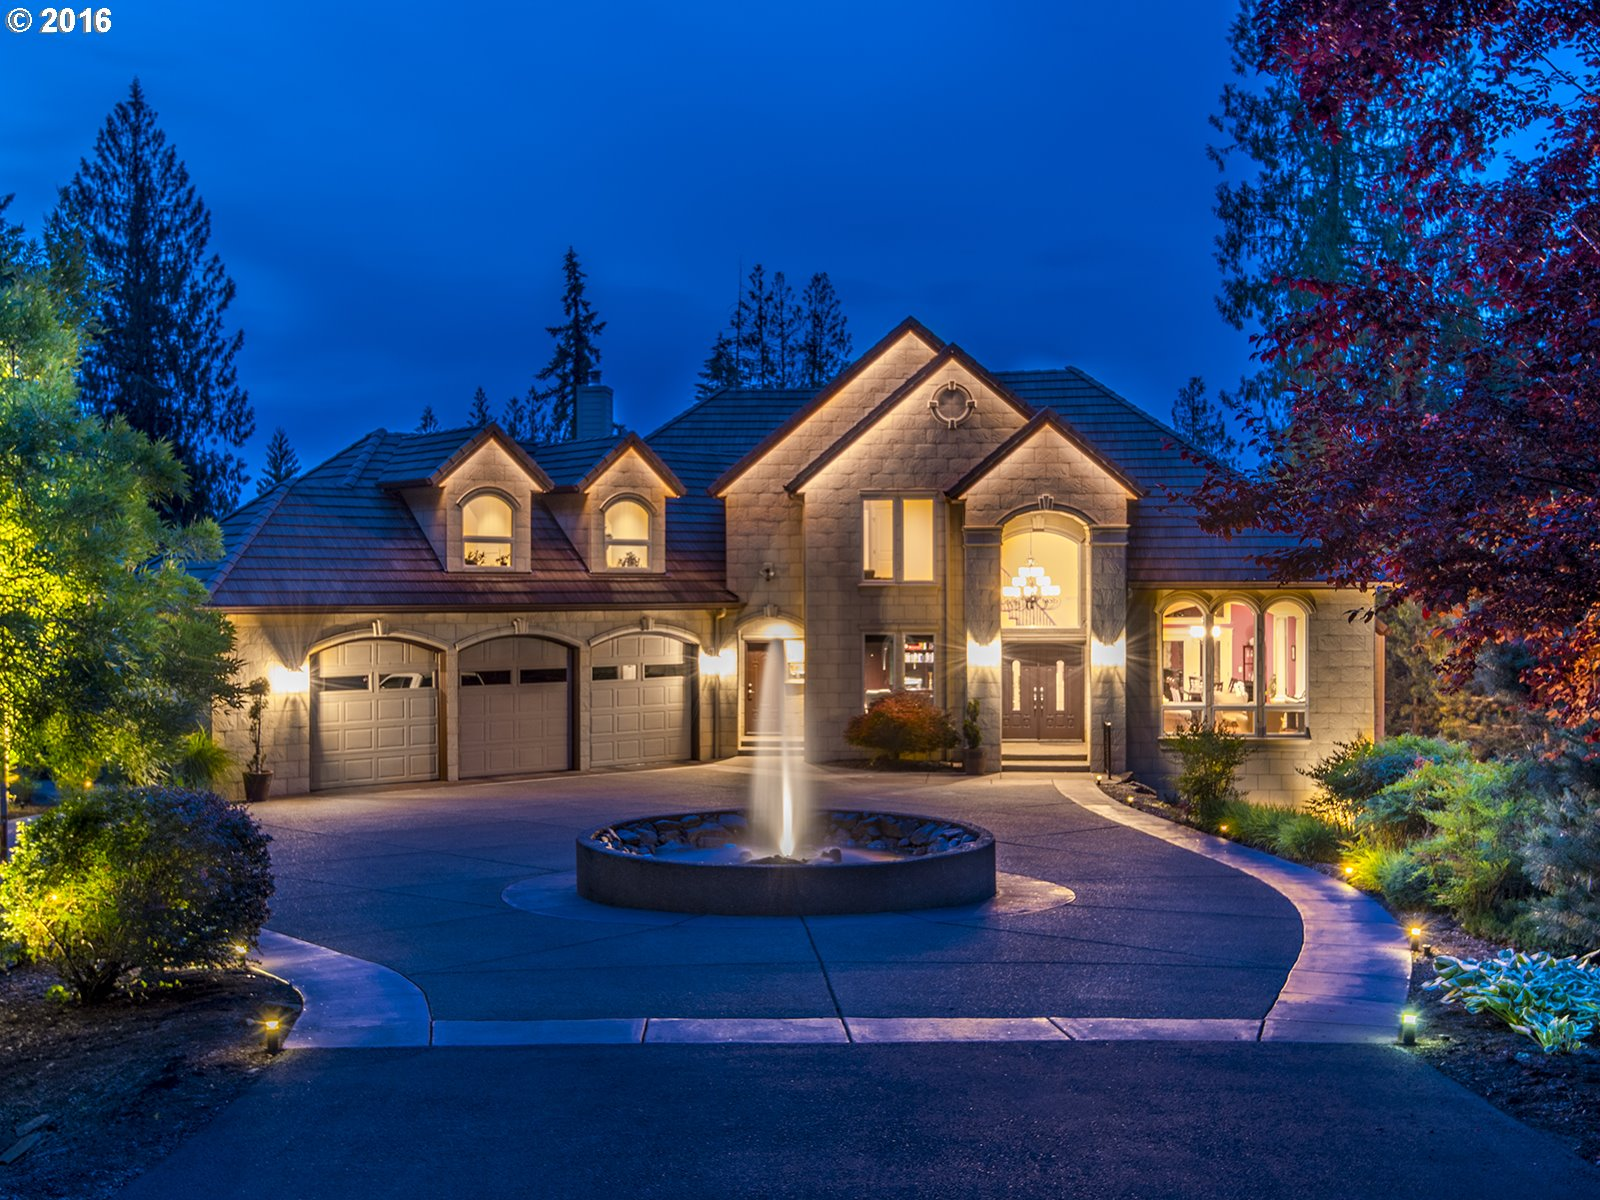 20401 S DRIFTWOOD DR, Oregon City, OR 97045